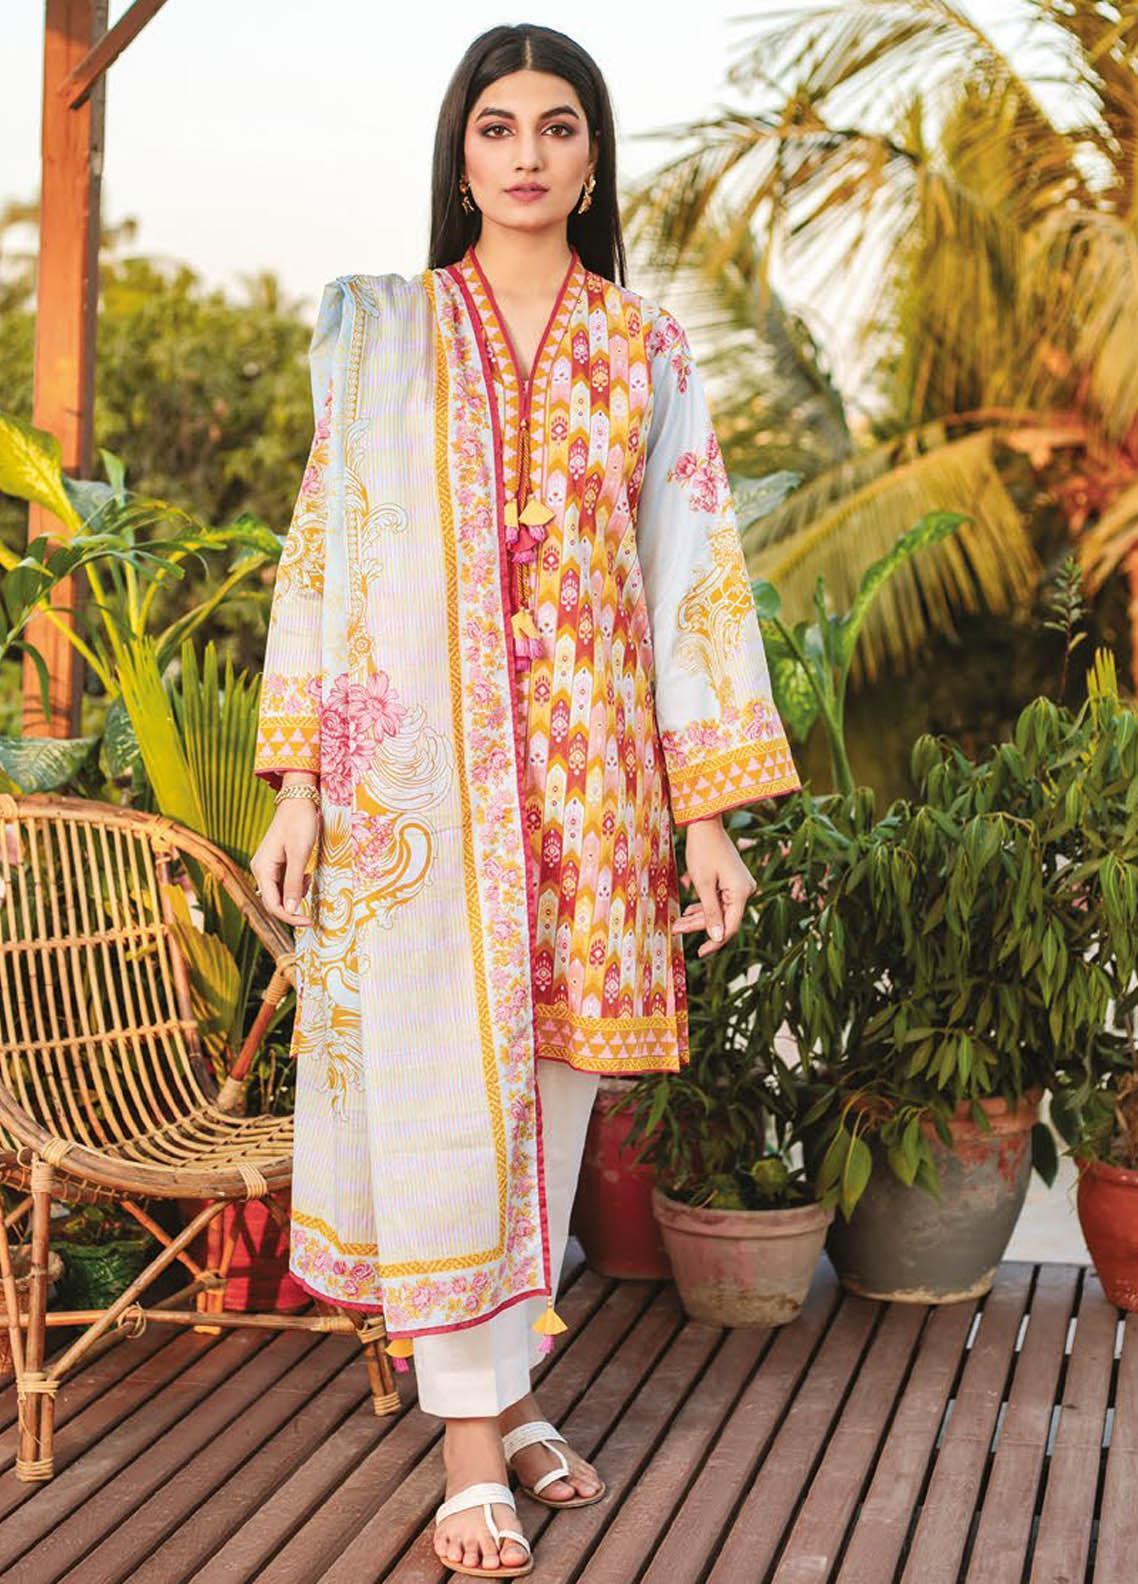 Orient Textile Printed Lawn Suits Unstitched 2 Piece OTL-21-025 Blue - Summer Collection